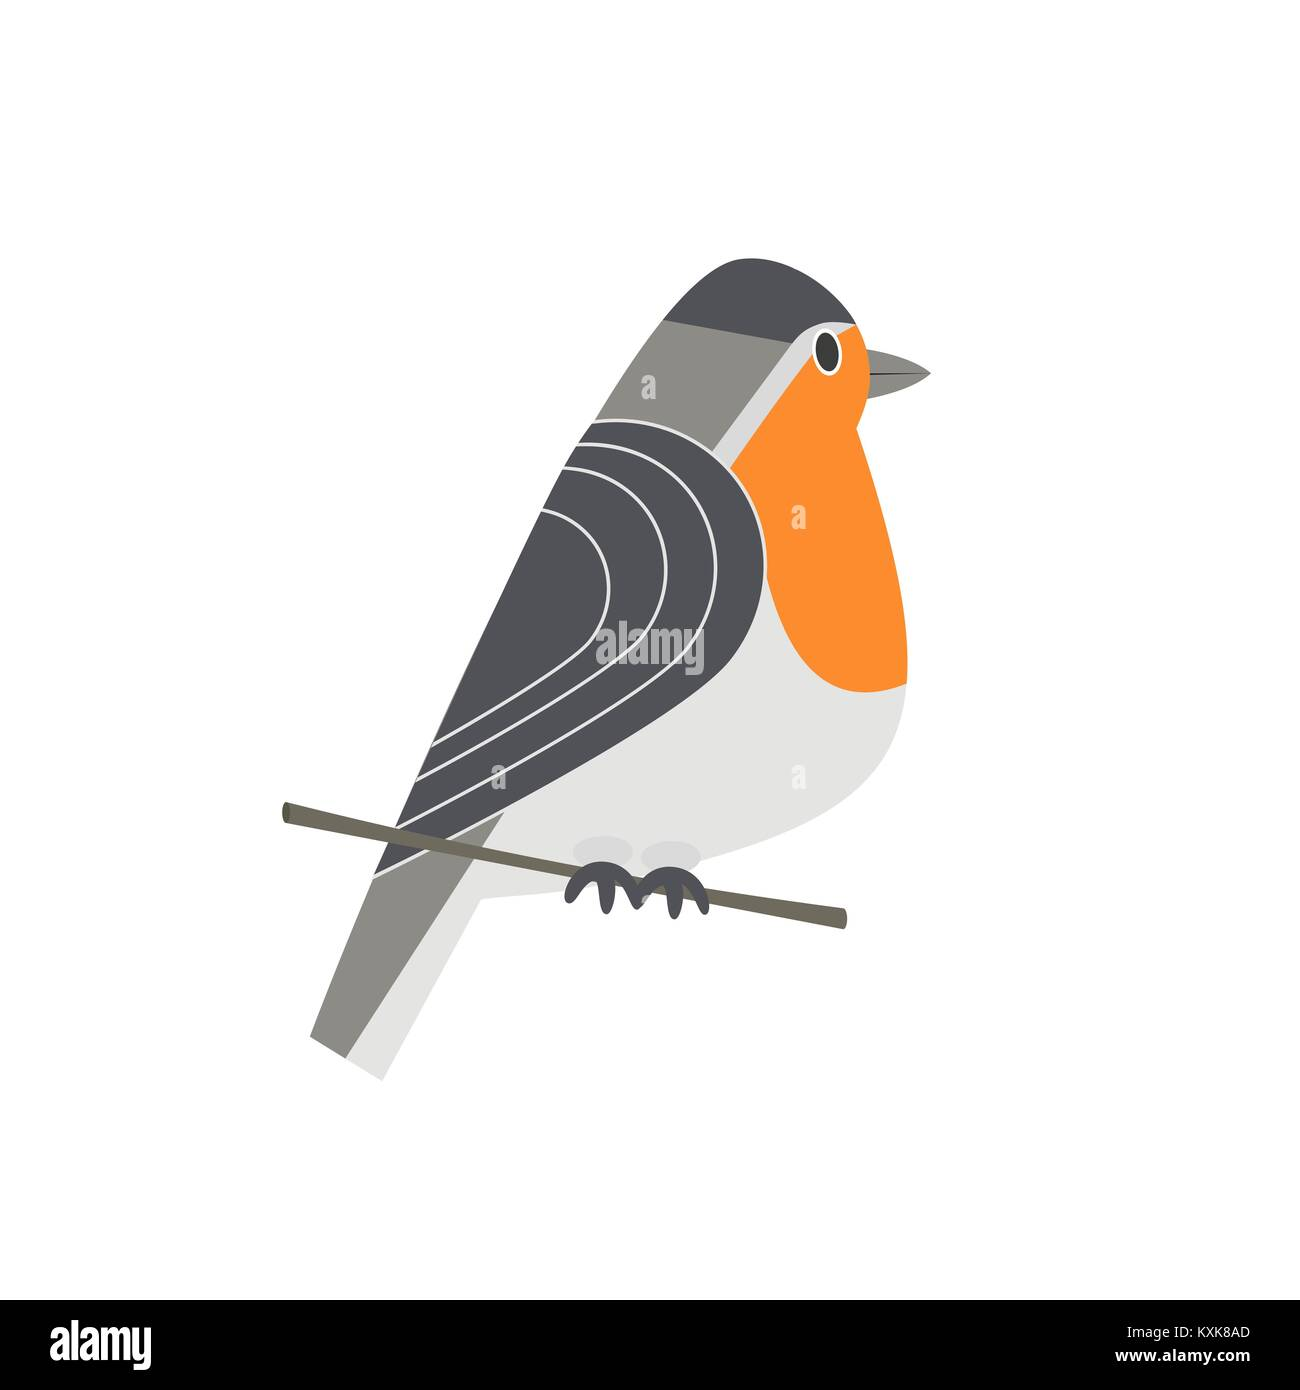 Robin Bird Drawing Vector Stockfotos & Robin Bird Drawing Vector ...